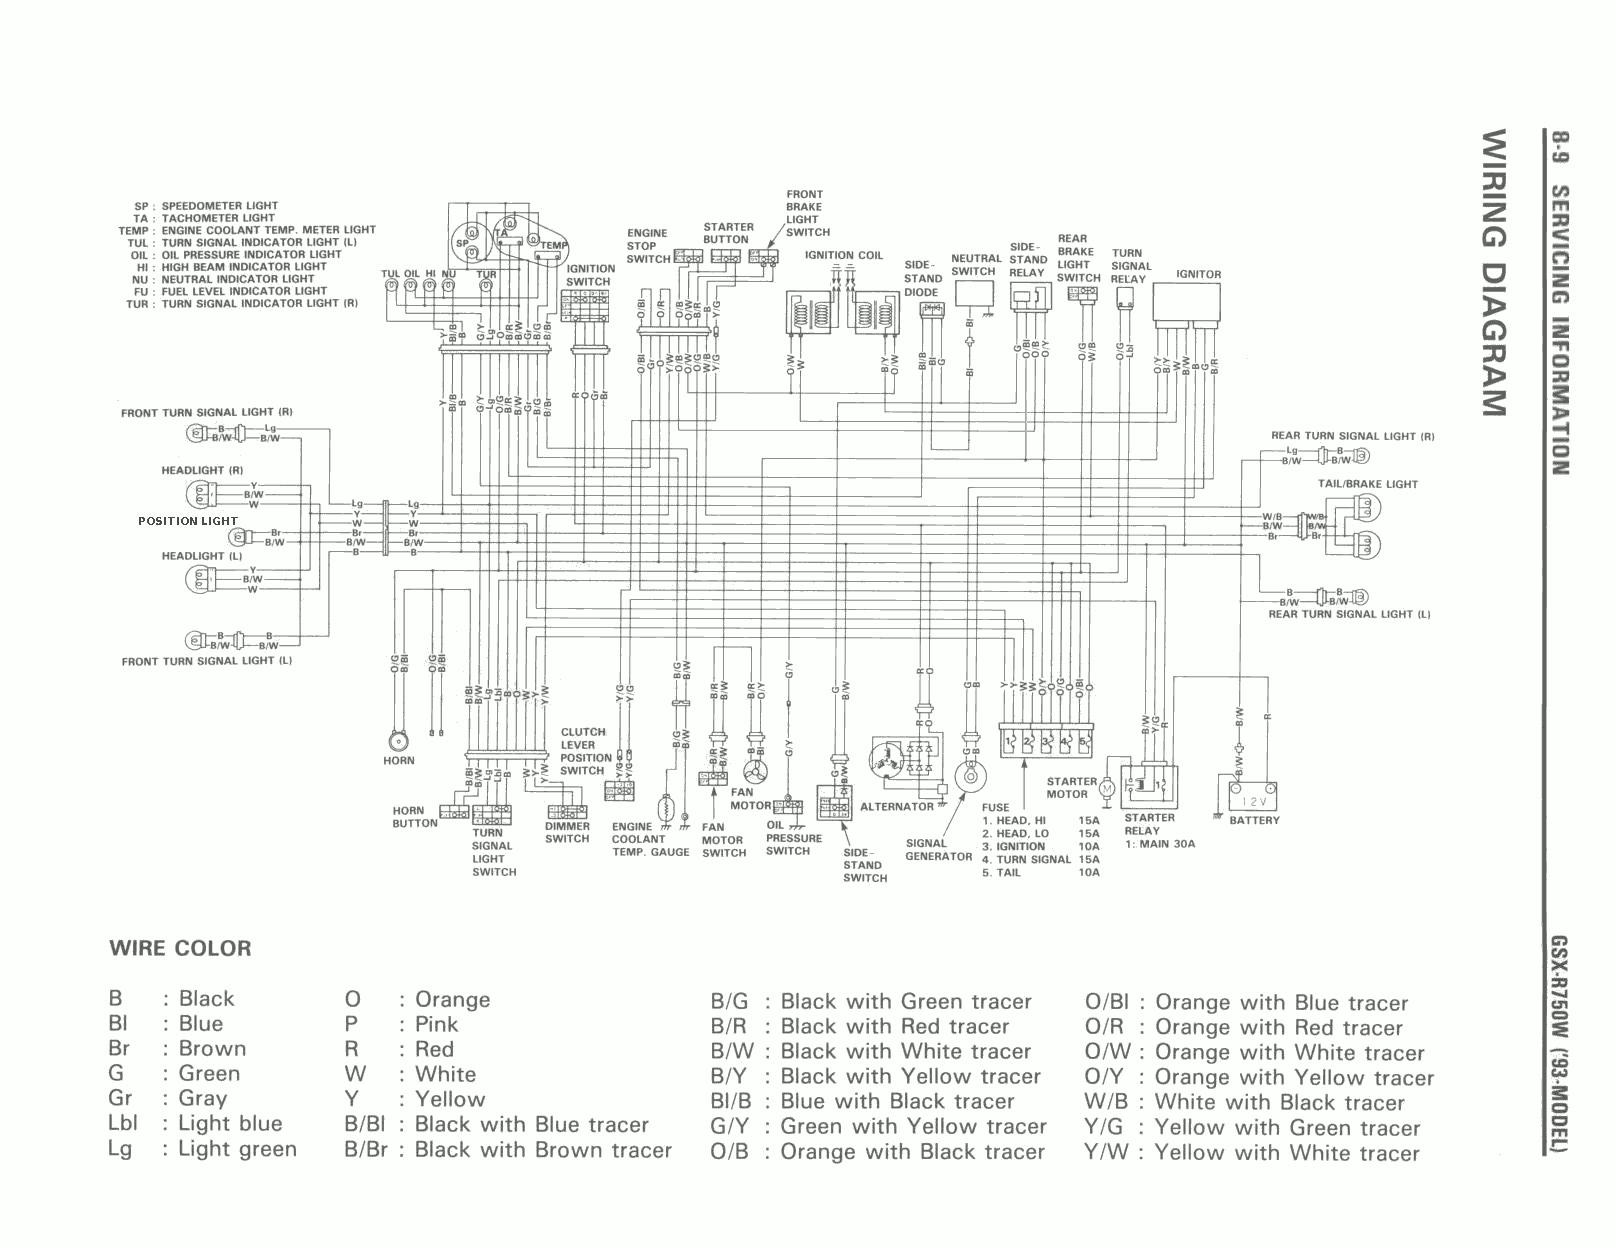 04 Zx10 Wiring Diagram Datsun 620 Alternator Wiring Diagram